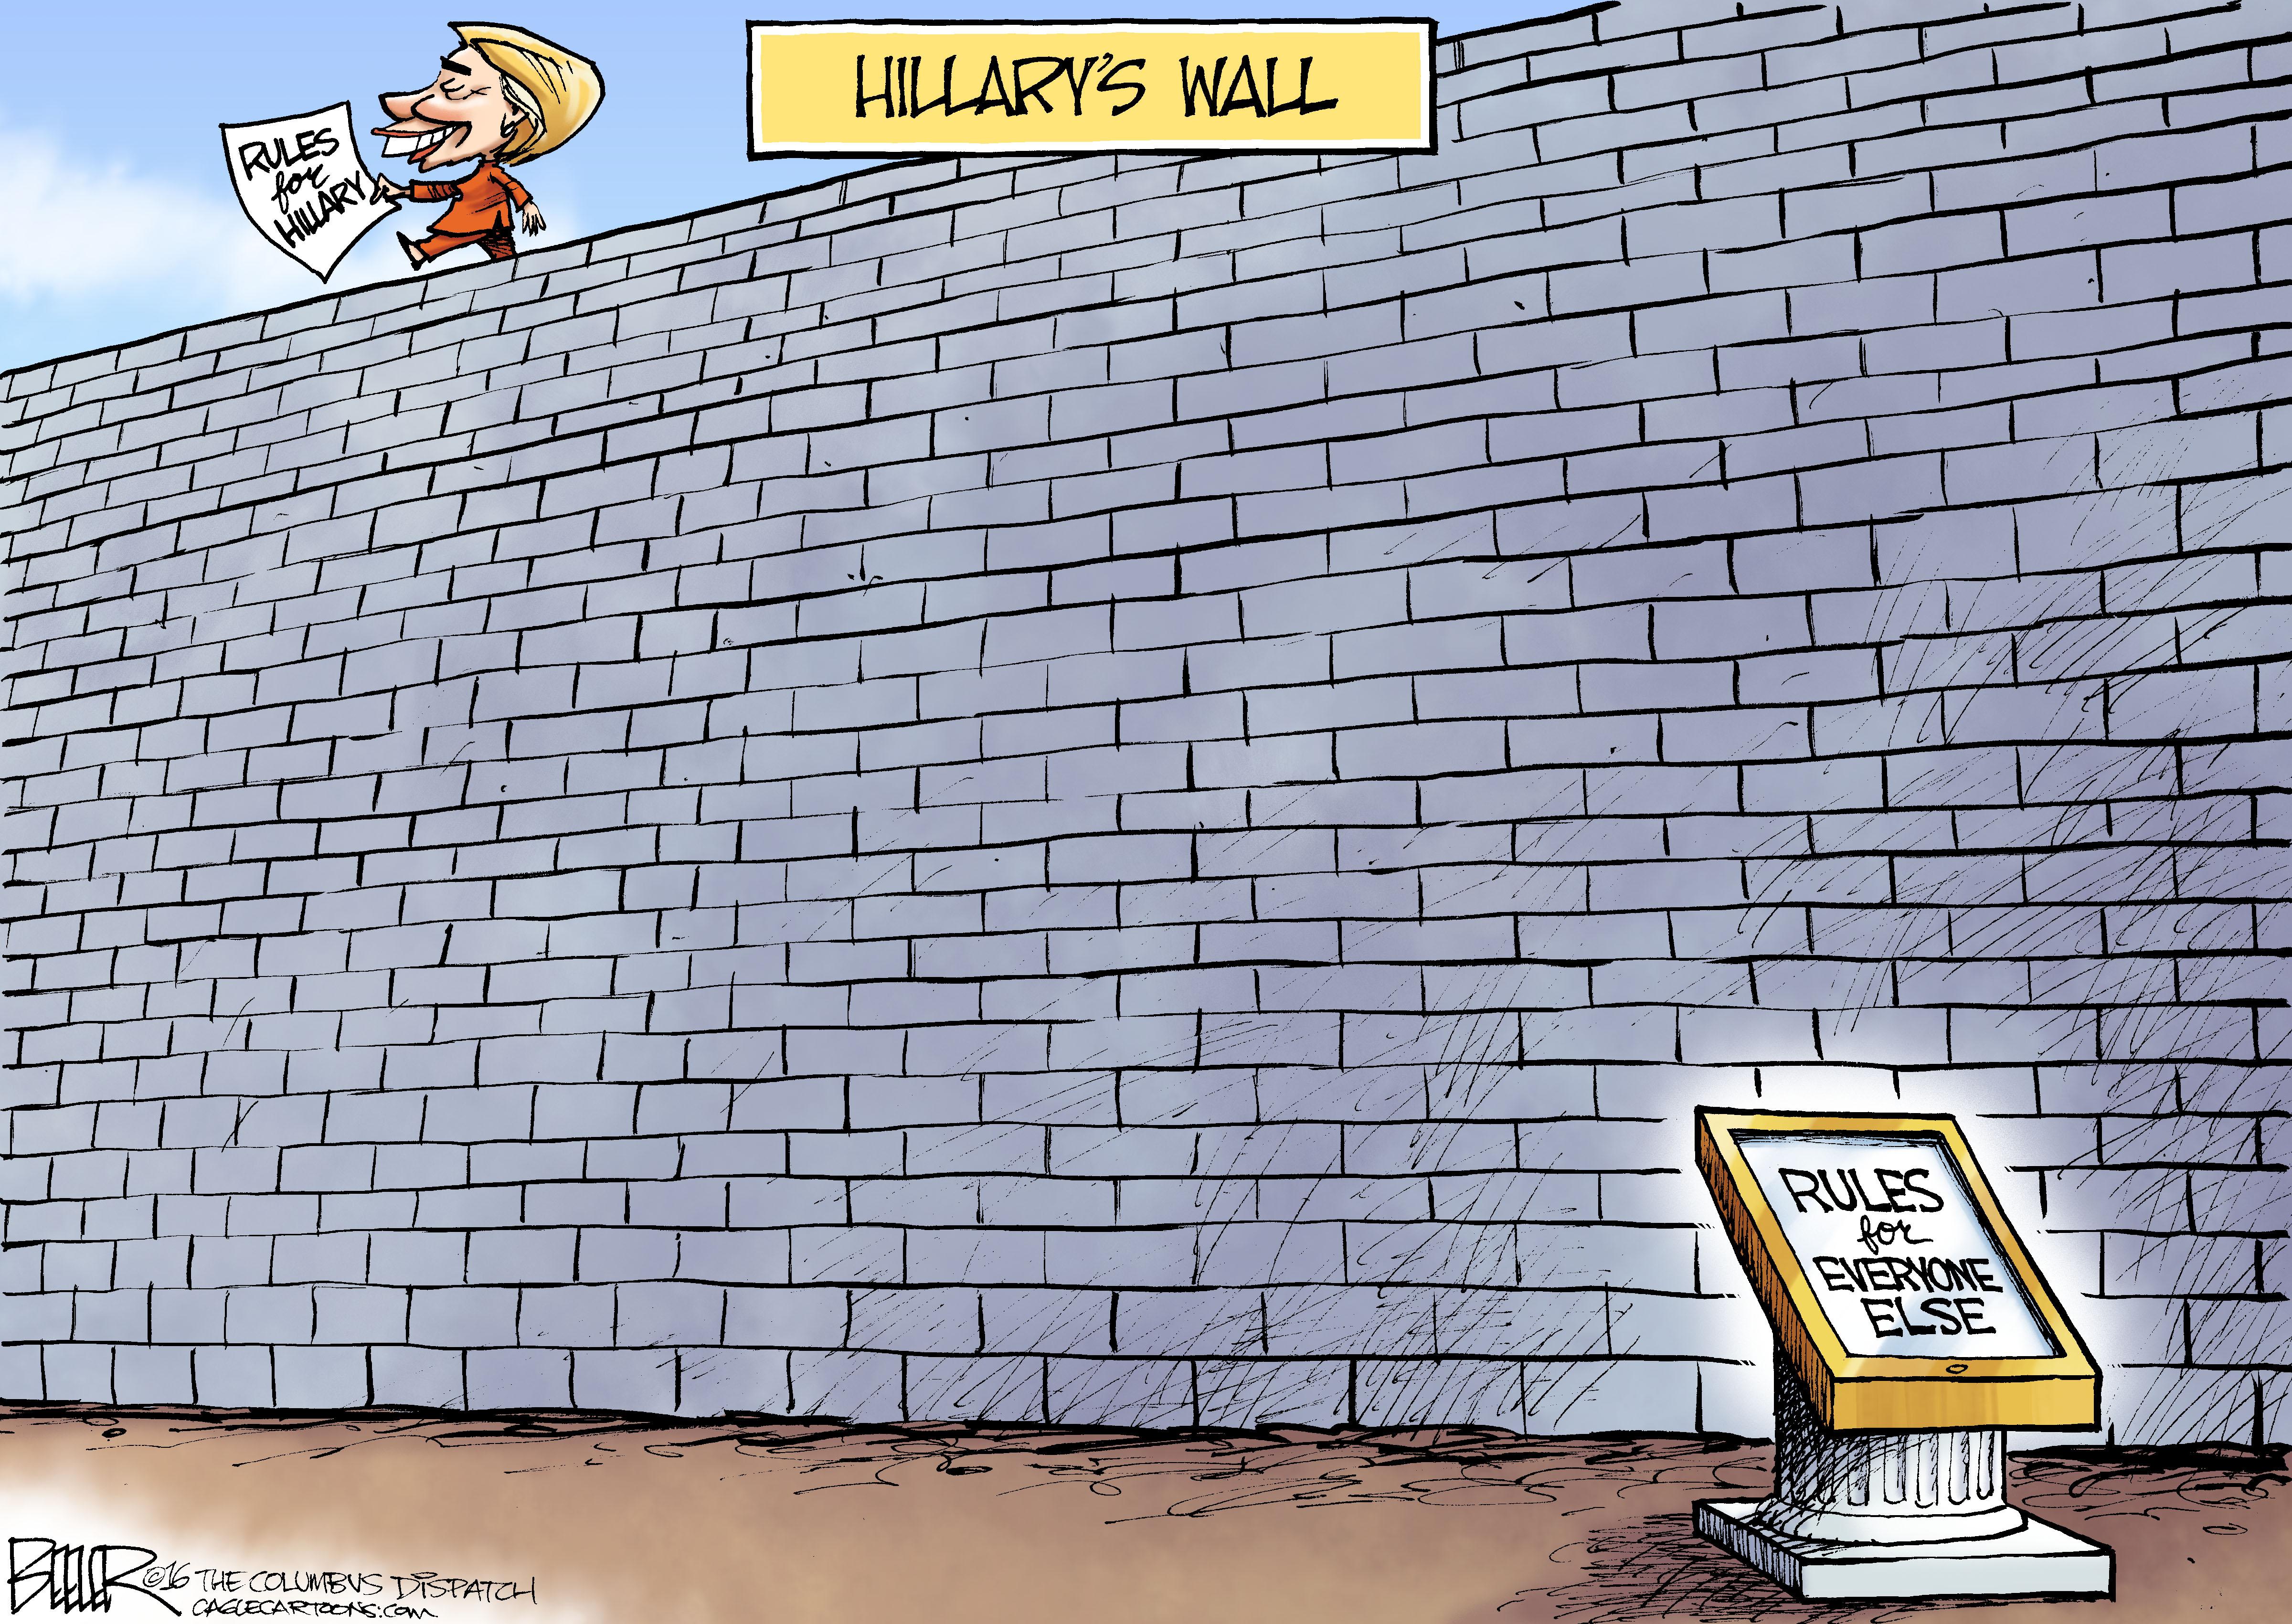 Clinton Rules